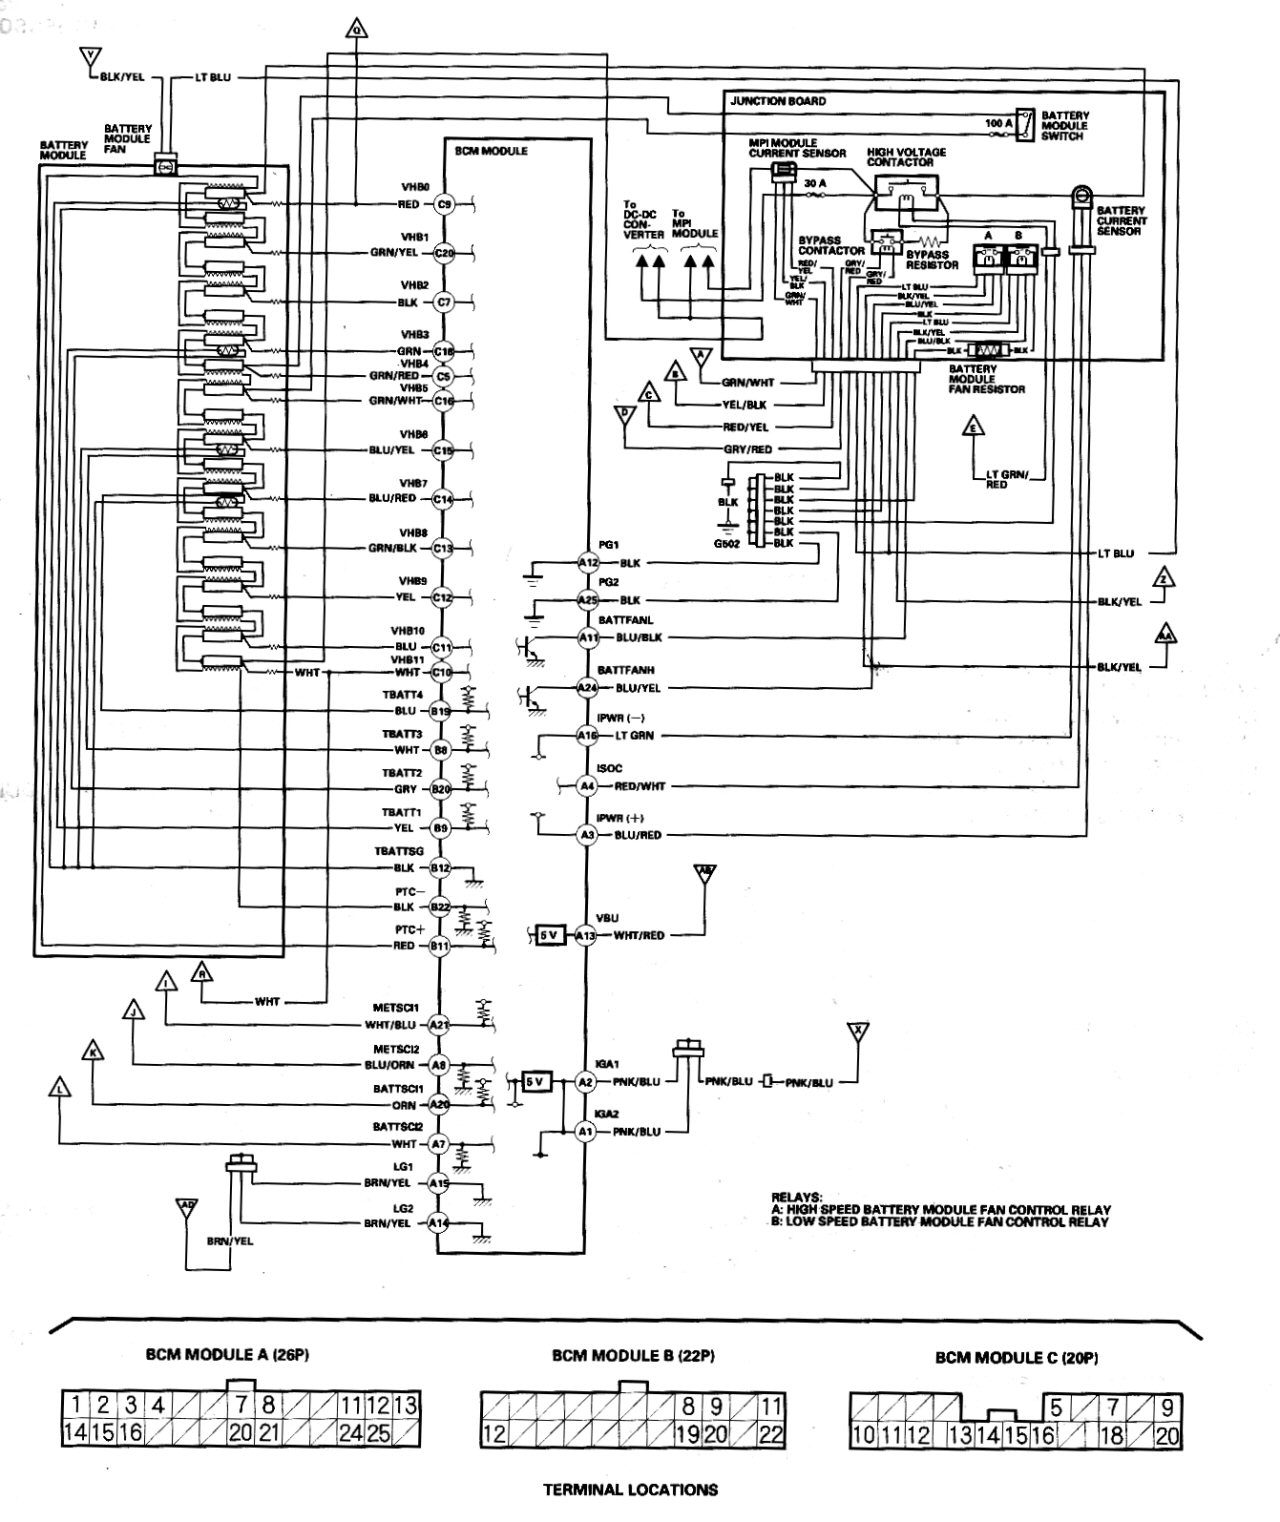 Honda Insight Wiring Diagram | Wiring Schematic Diagram - 7 ... on 2010 toyota camry wiring diagram, 2012 mazda 3 wiring diagram, 2010 nissan altima wiring diagram, 2005 subaru legacy wiring diagram, 2010 dodge caliber wiring diagram, 2010 toyota corolla wiring diagram, 2006 acura tl wiring diagram, 2010 mercury milan wiring diagram, 2010 kia forte wiring diagram, 2010 dodge charger wiring diagram, 2010 subaru legacy wiring diagram, 2010 buick lacrosse wiring diagram, 2010 mazda 3 wiring diagram, 2010 chrysler sebring wiring diagram, 1996 bmw z3 wiring diagram,